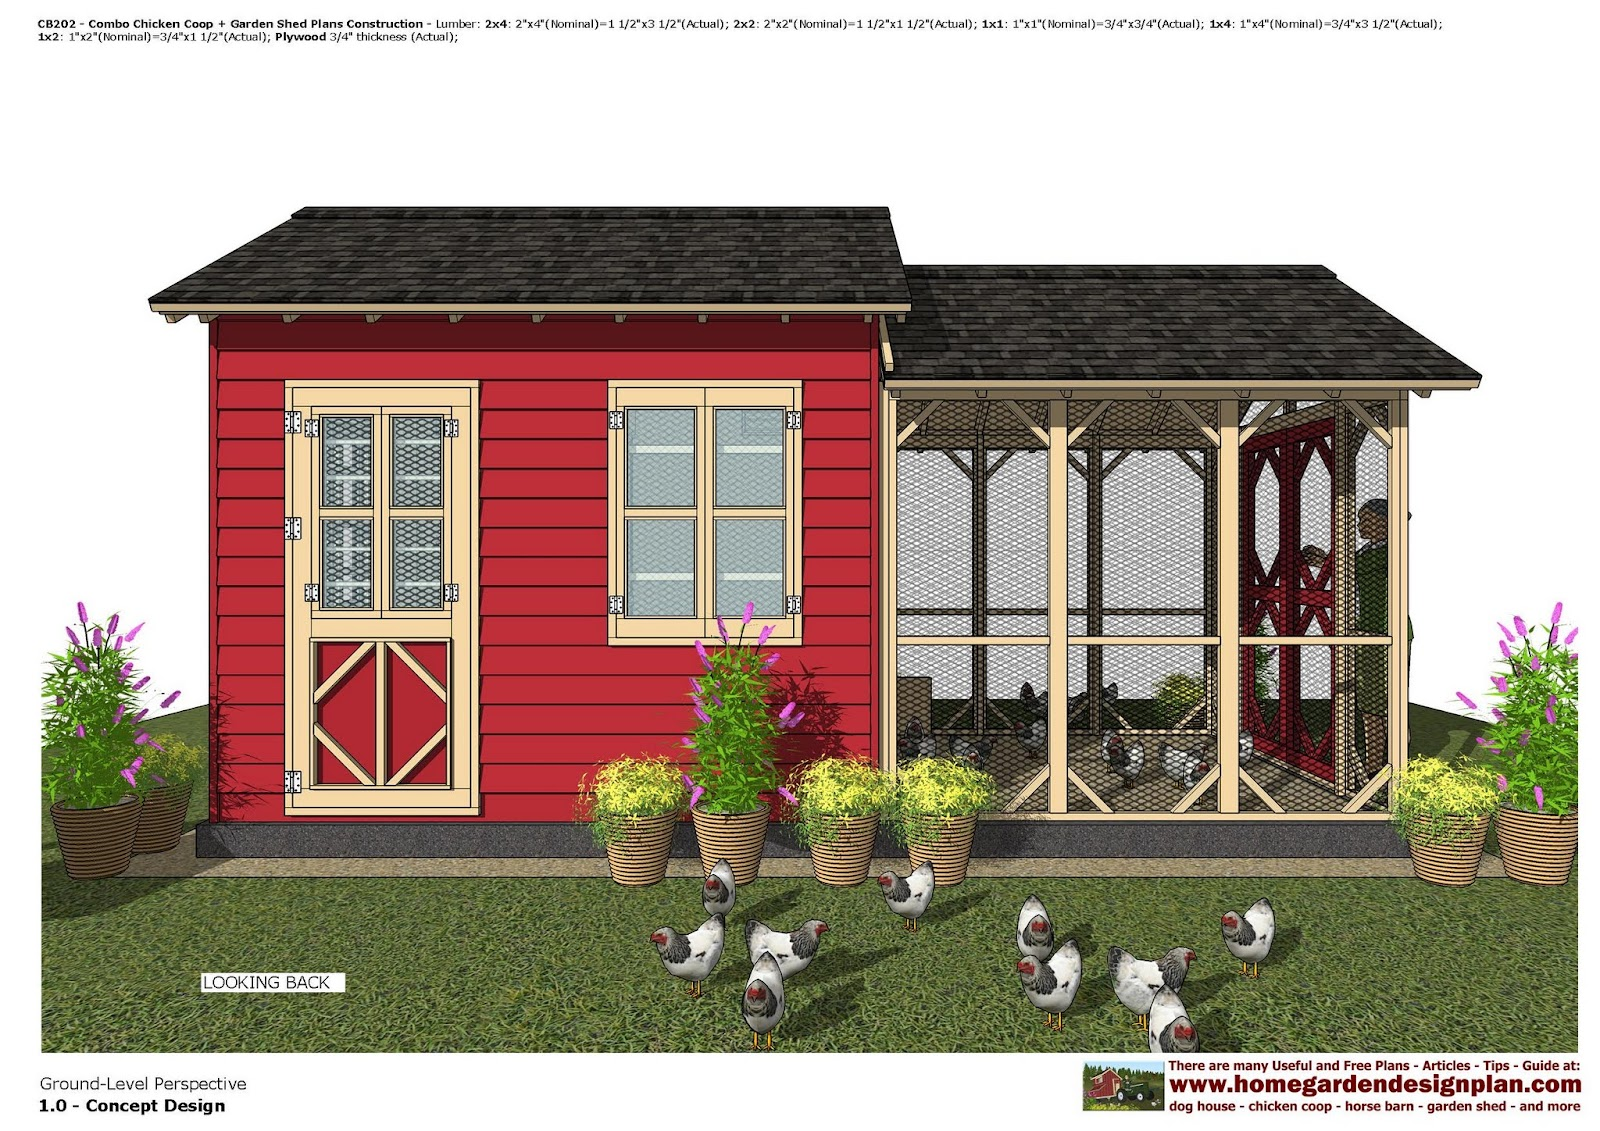 Cb202 Combo En Coop Garden Shed Plans Construction